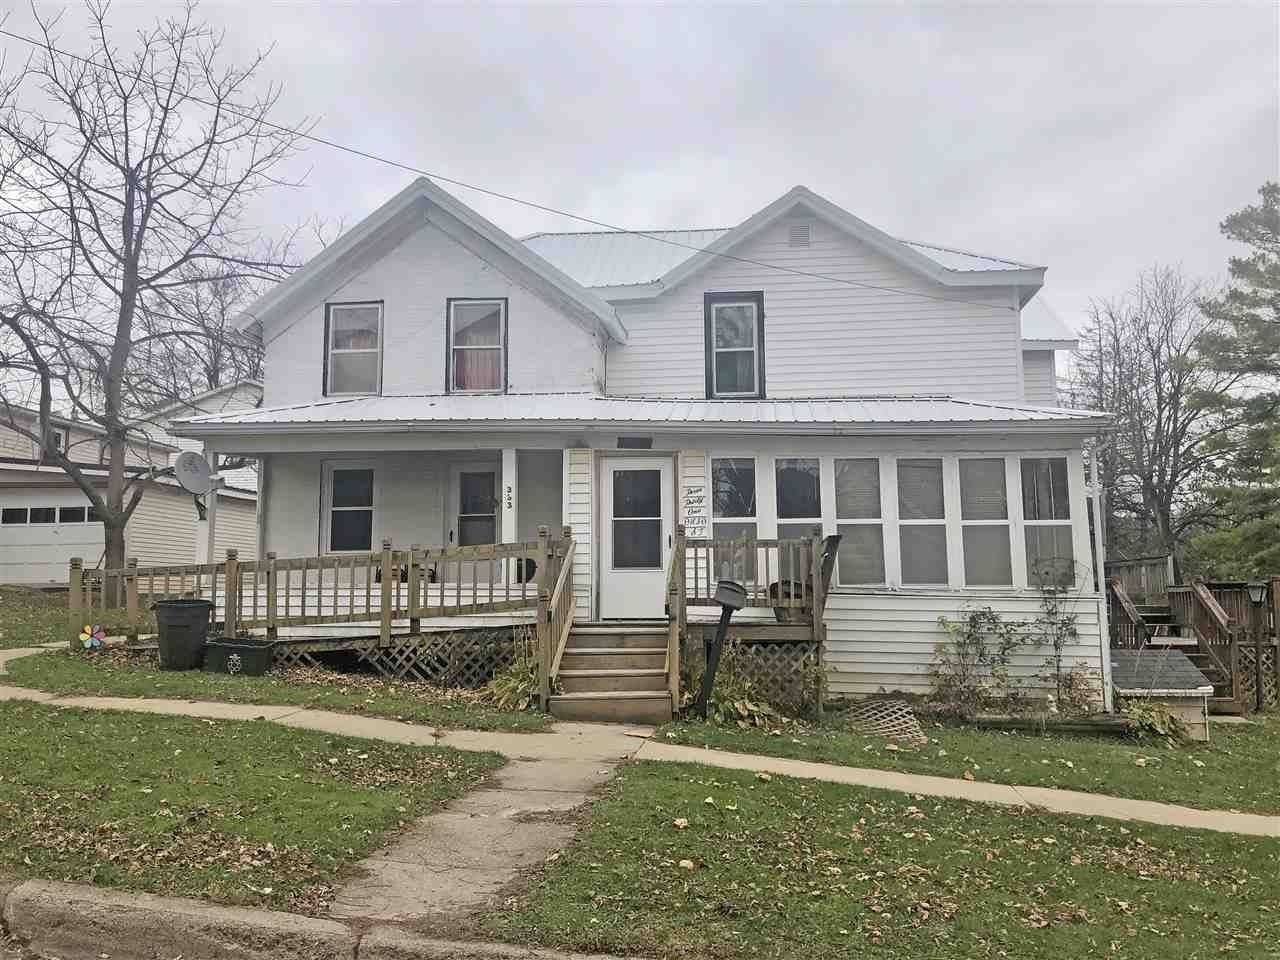 331 Ohio St, Darlington, WI 53530 - #: 1897040